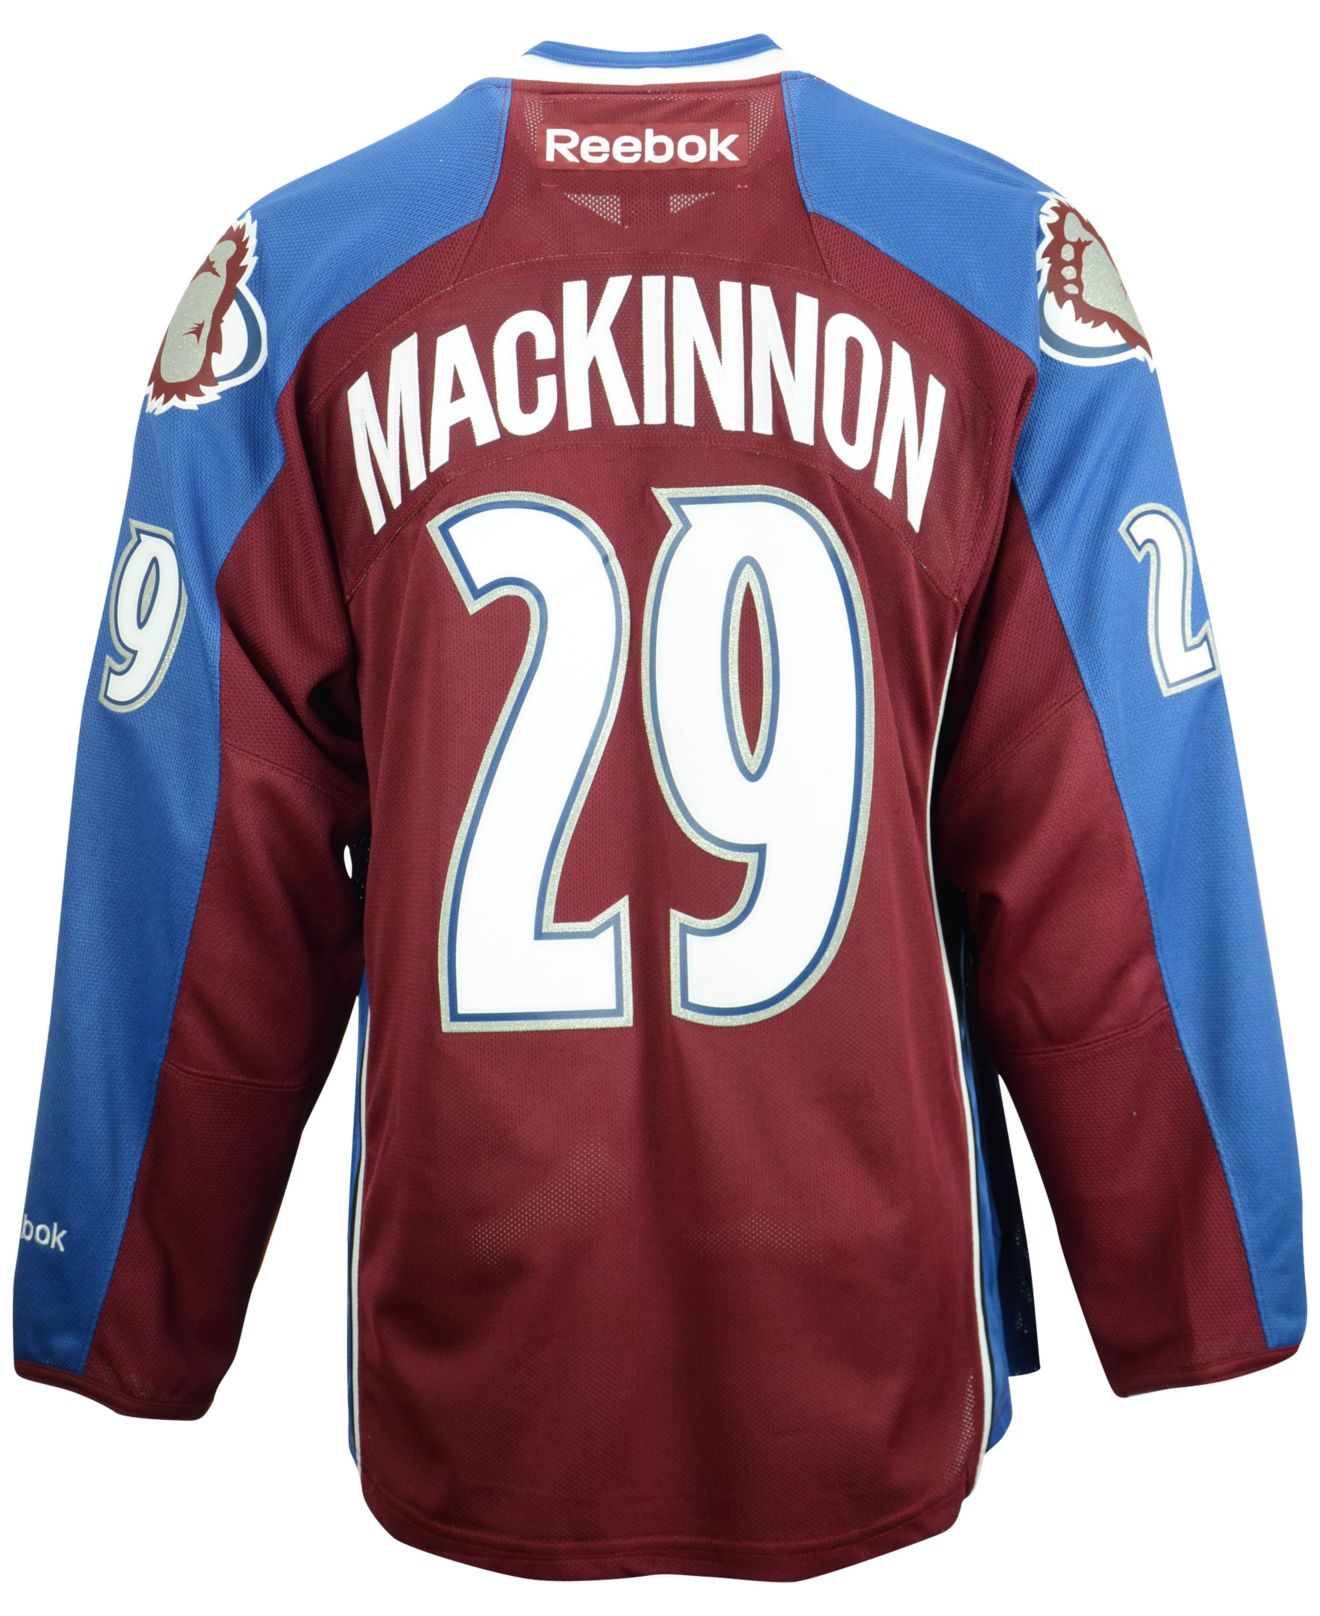 a84c9f3cc Lyst - Reebok Men s Nathan Mackinnon Colorado Avalanche Premier ...